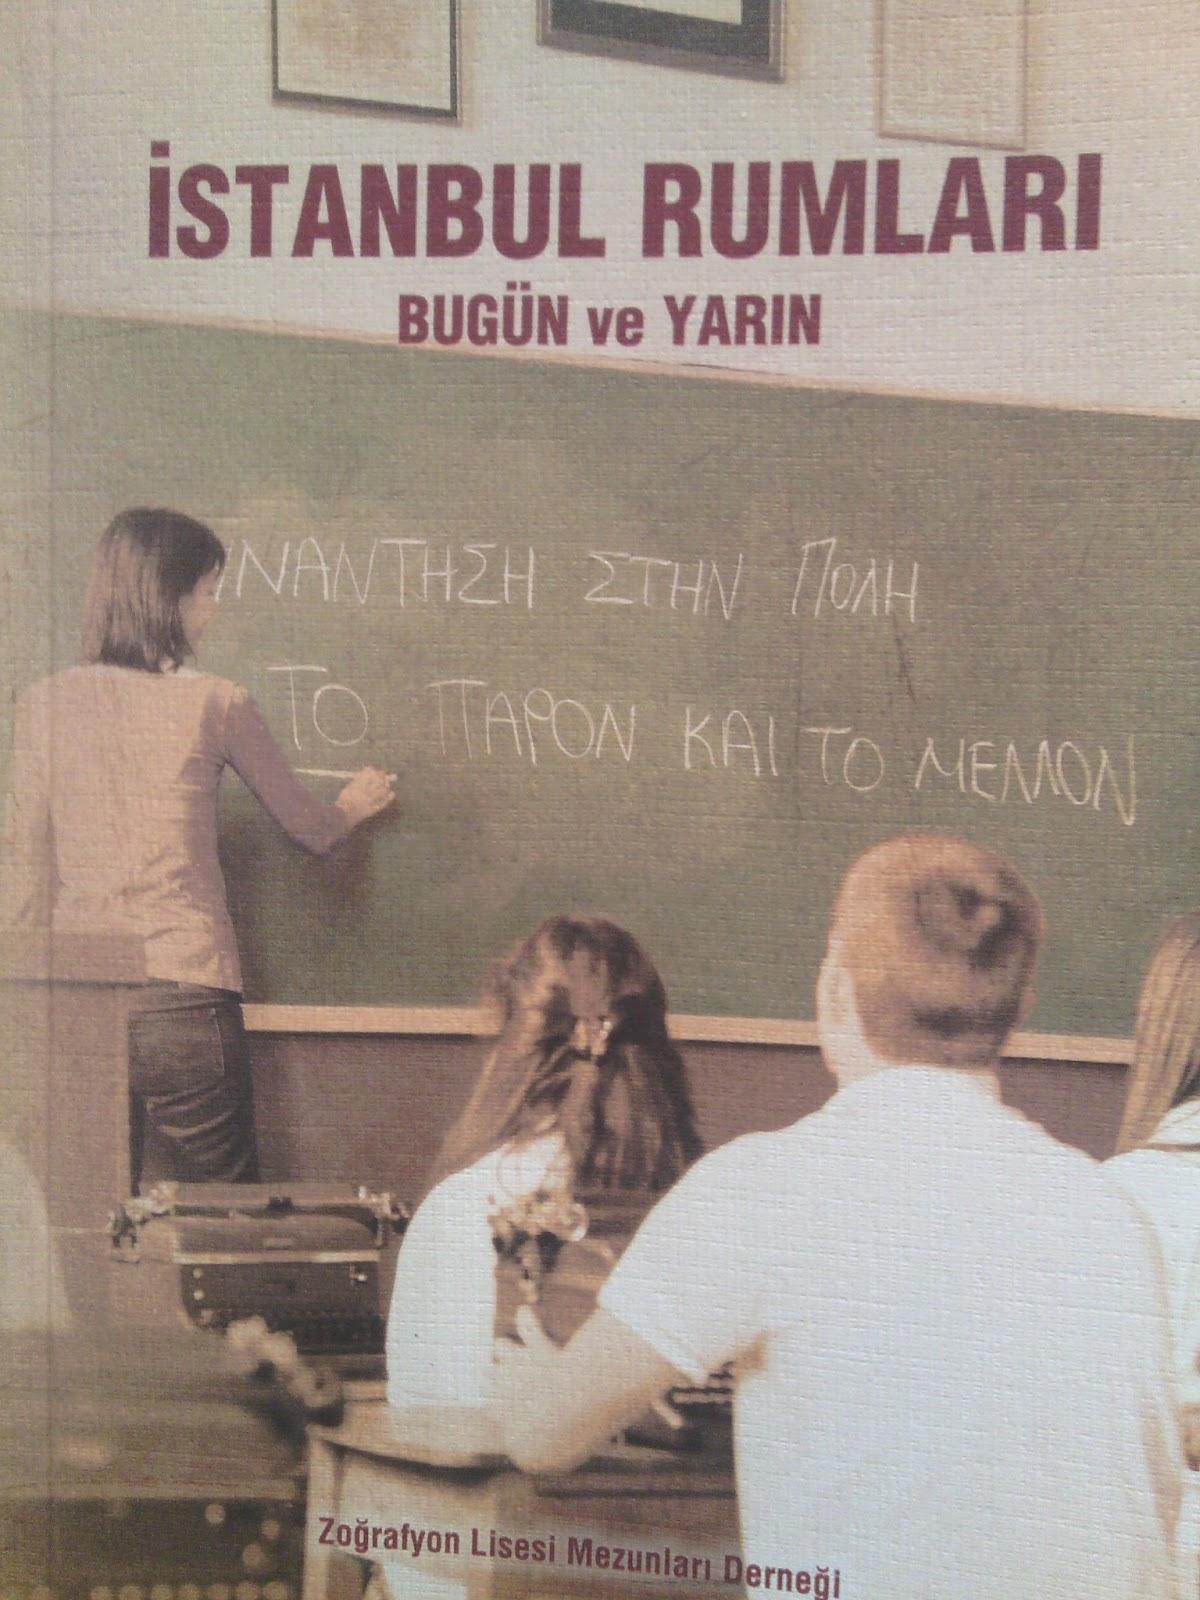 İstanbul Rum Cemaati İstos yayınları